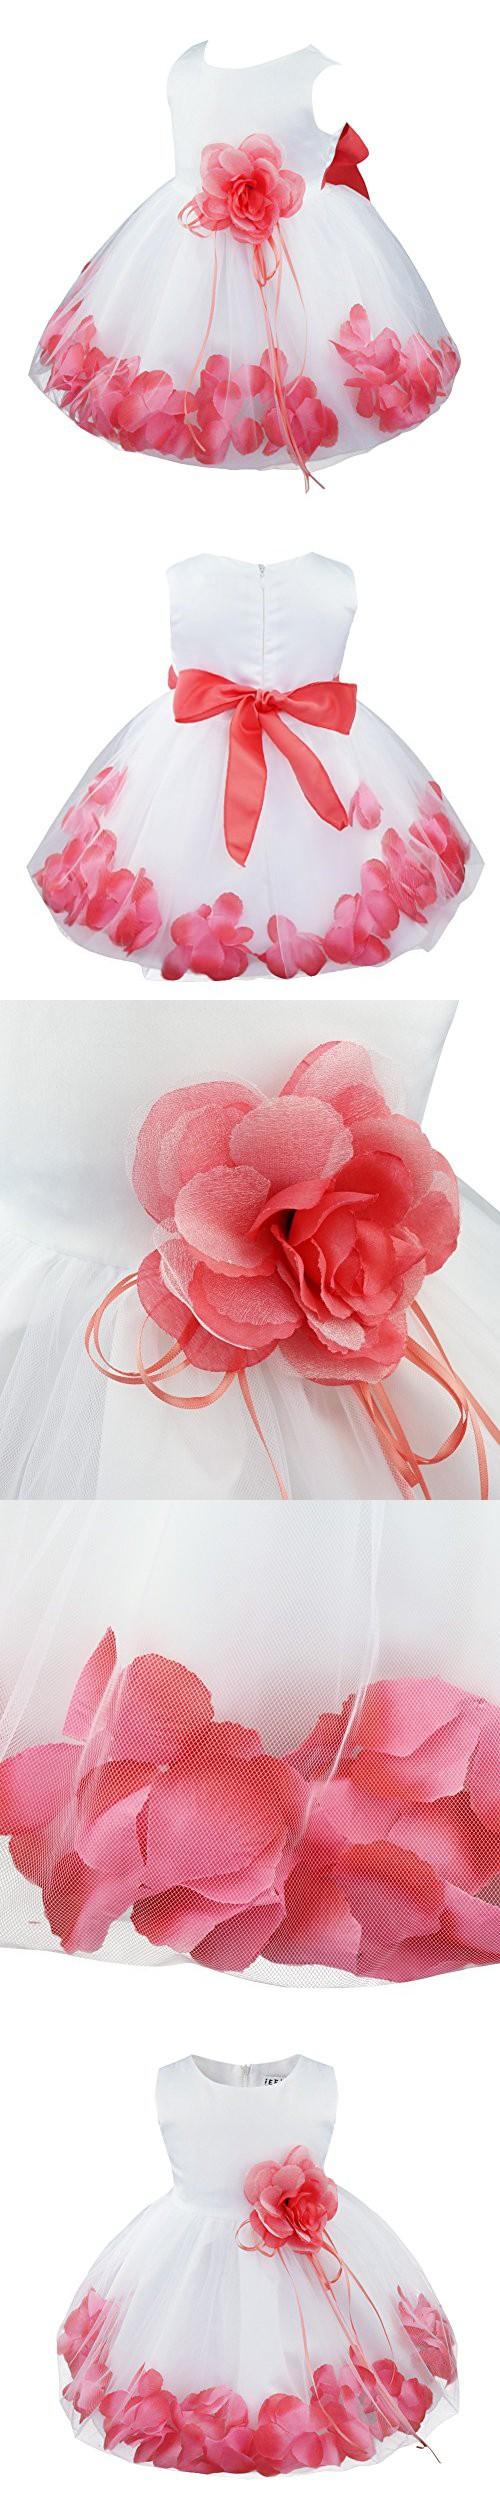 ebc8b6b5dcc1 TIAOBU Baby Girls Flower Petals Tulle Formal Bridesmaid Wedding ...